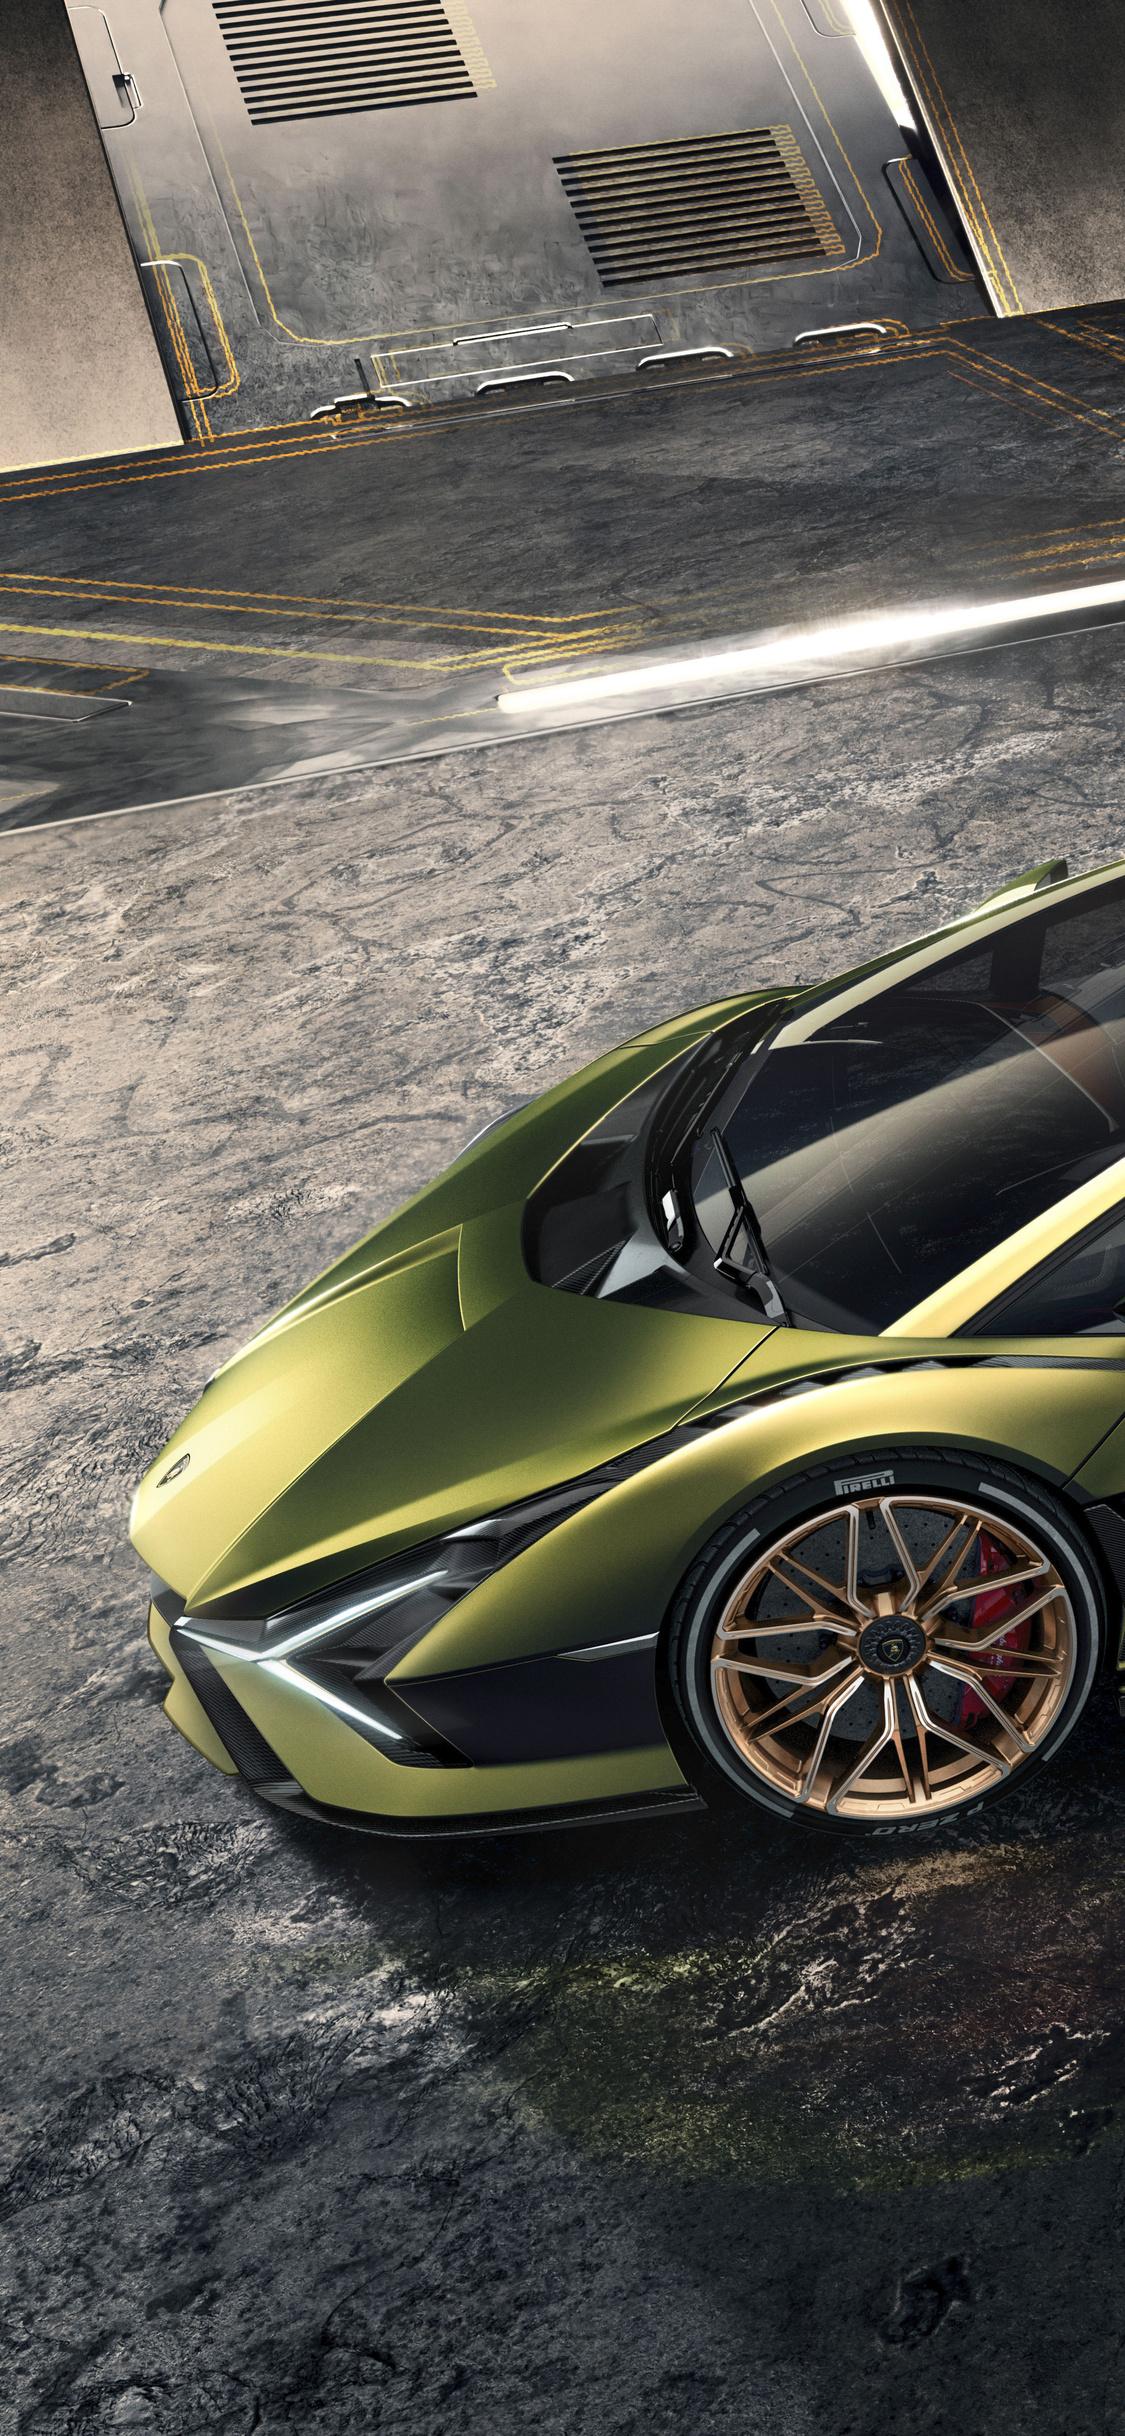 1125x2436 2019 Lamborghini Sian Iphone XS,Iphone 10,Iphone X